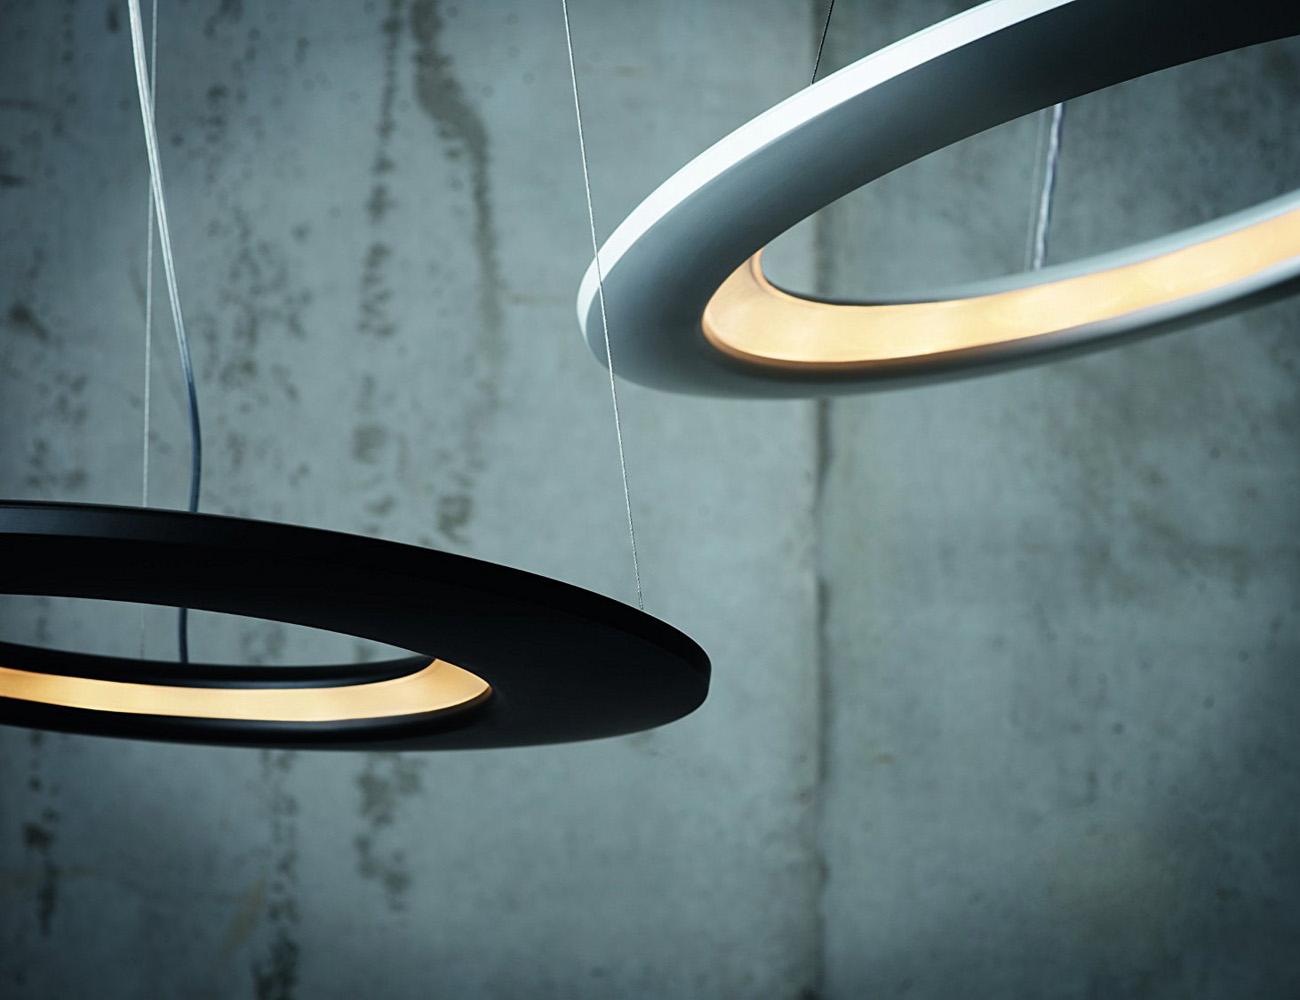 Ecliptic Pendant – An Interplanetary Pendant Lamp Design